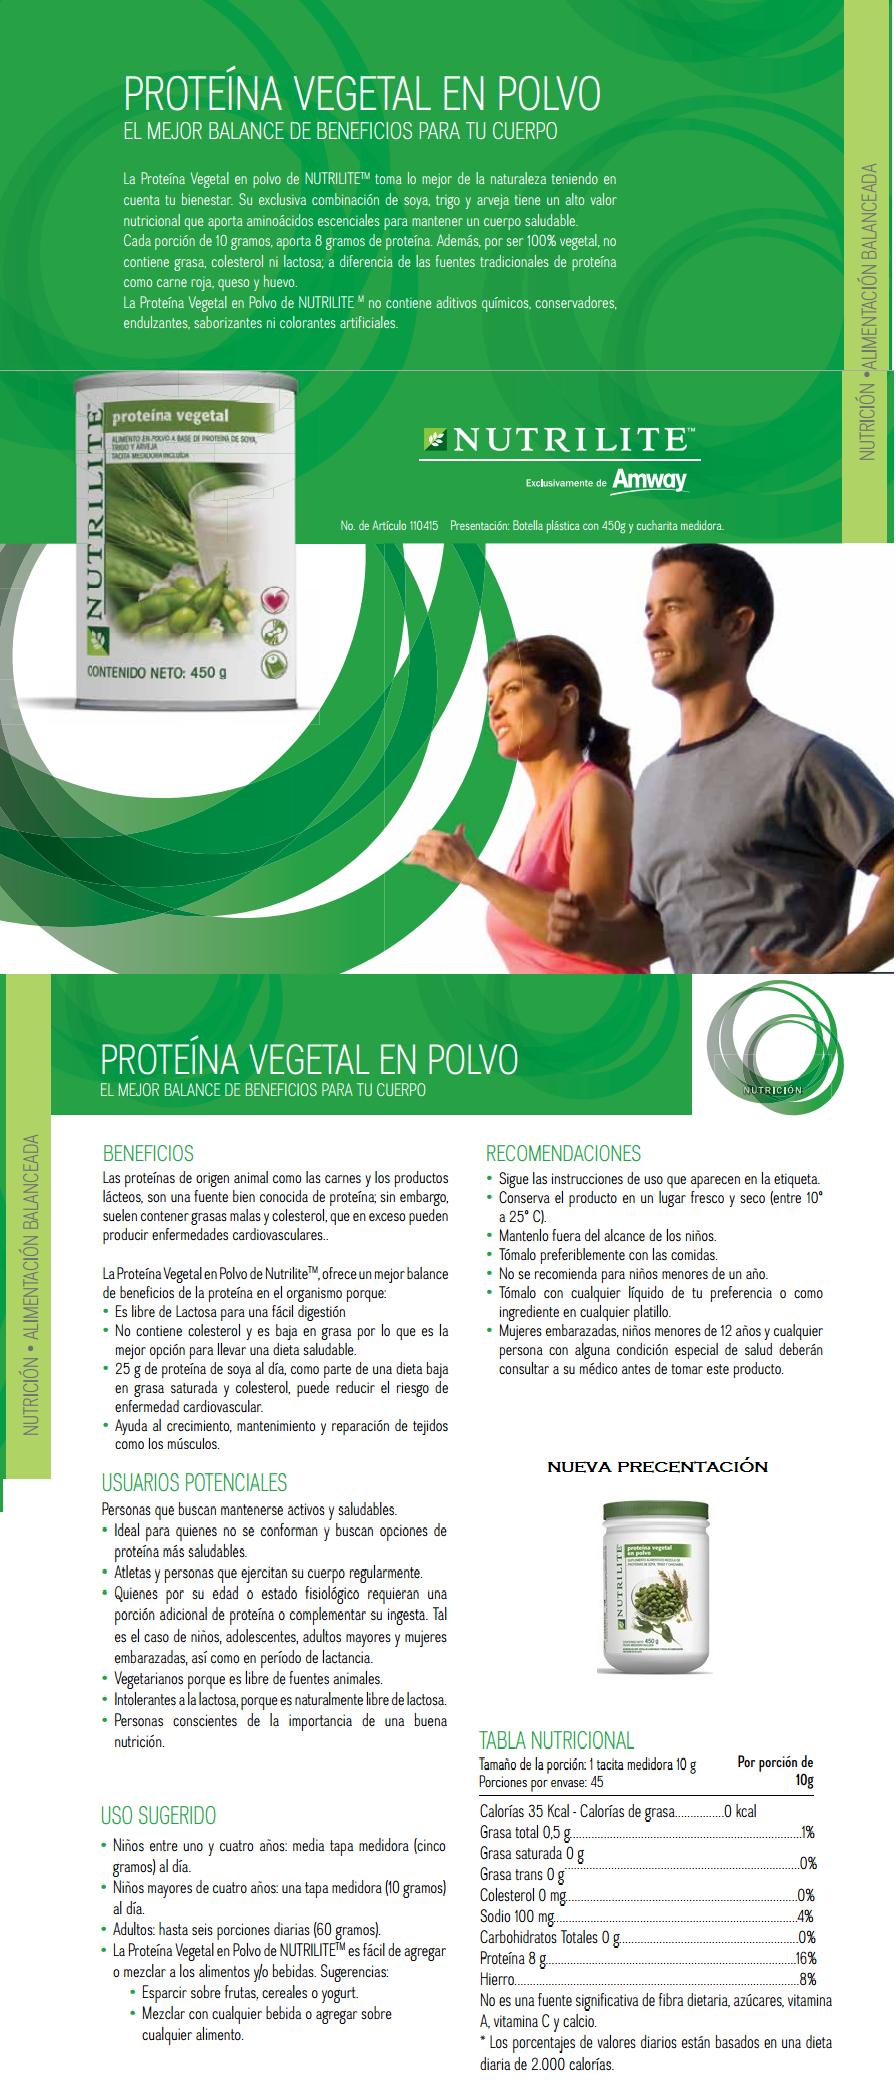 Proteina vegetal nutrilite sirve para adelgazar